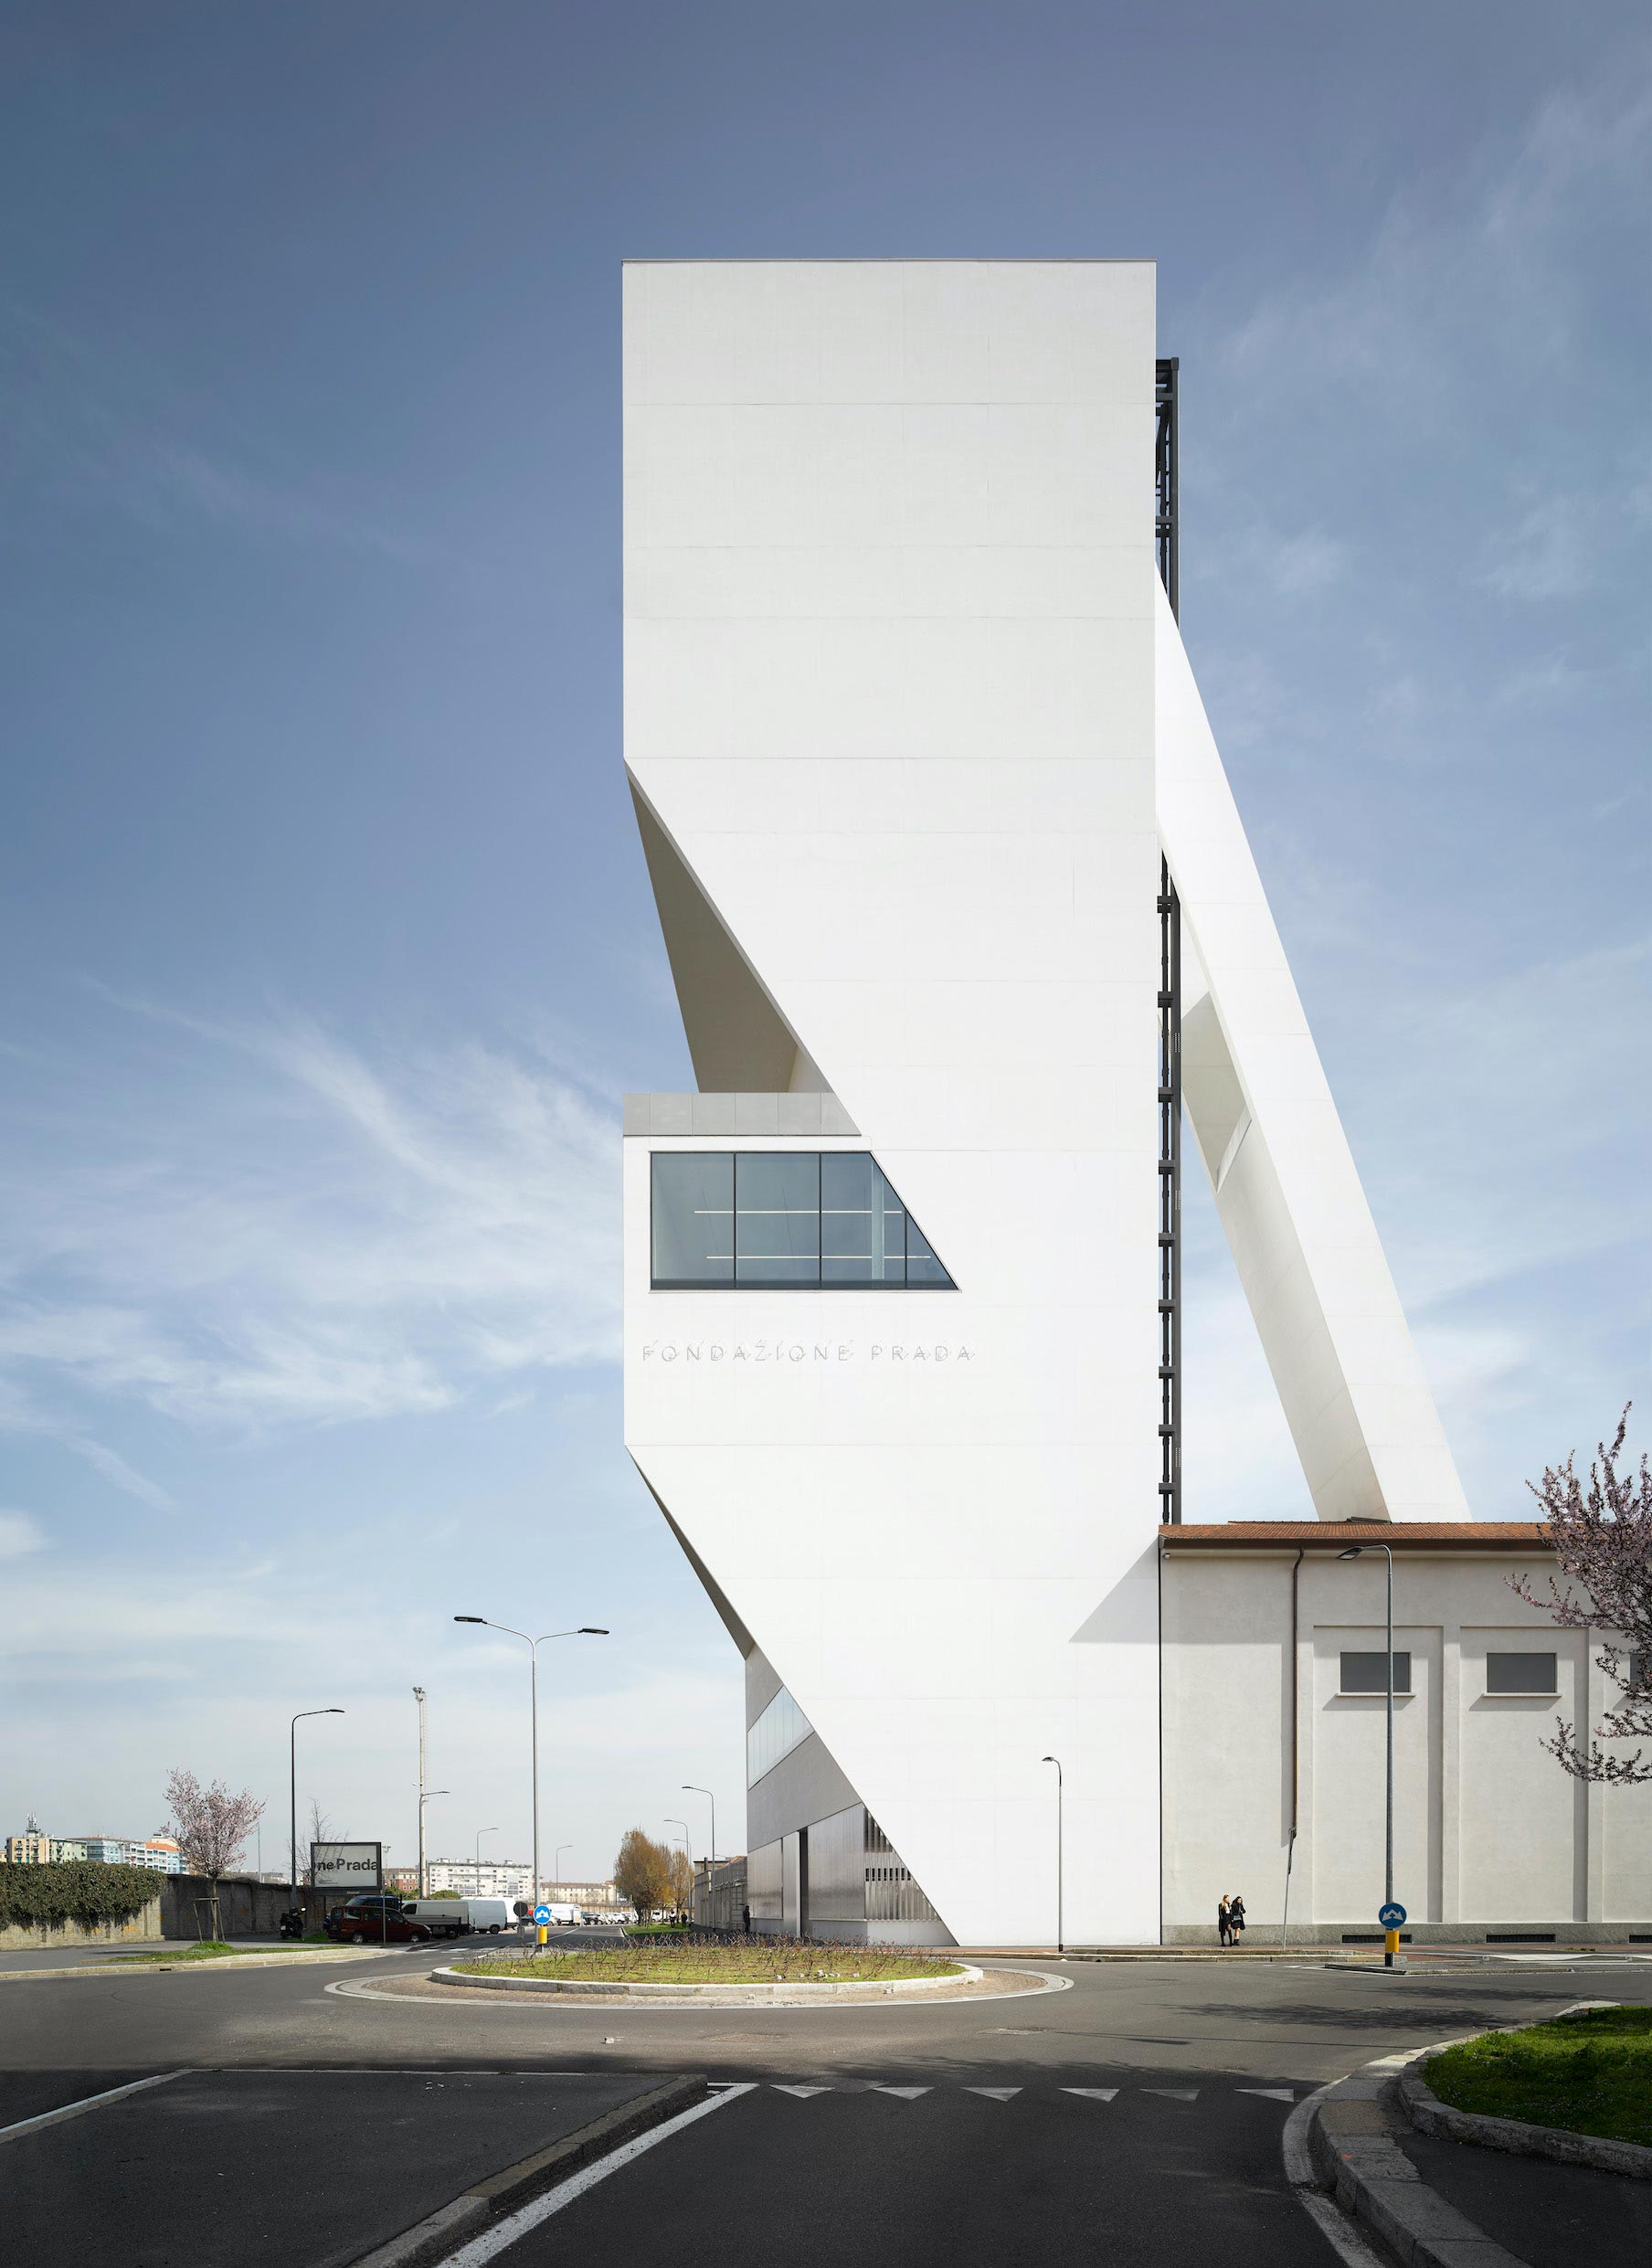 Nord ovest Torre Fondazione Prada